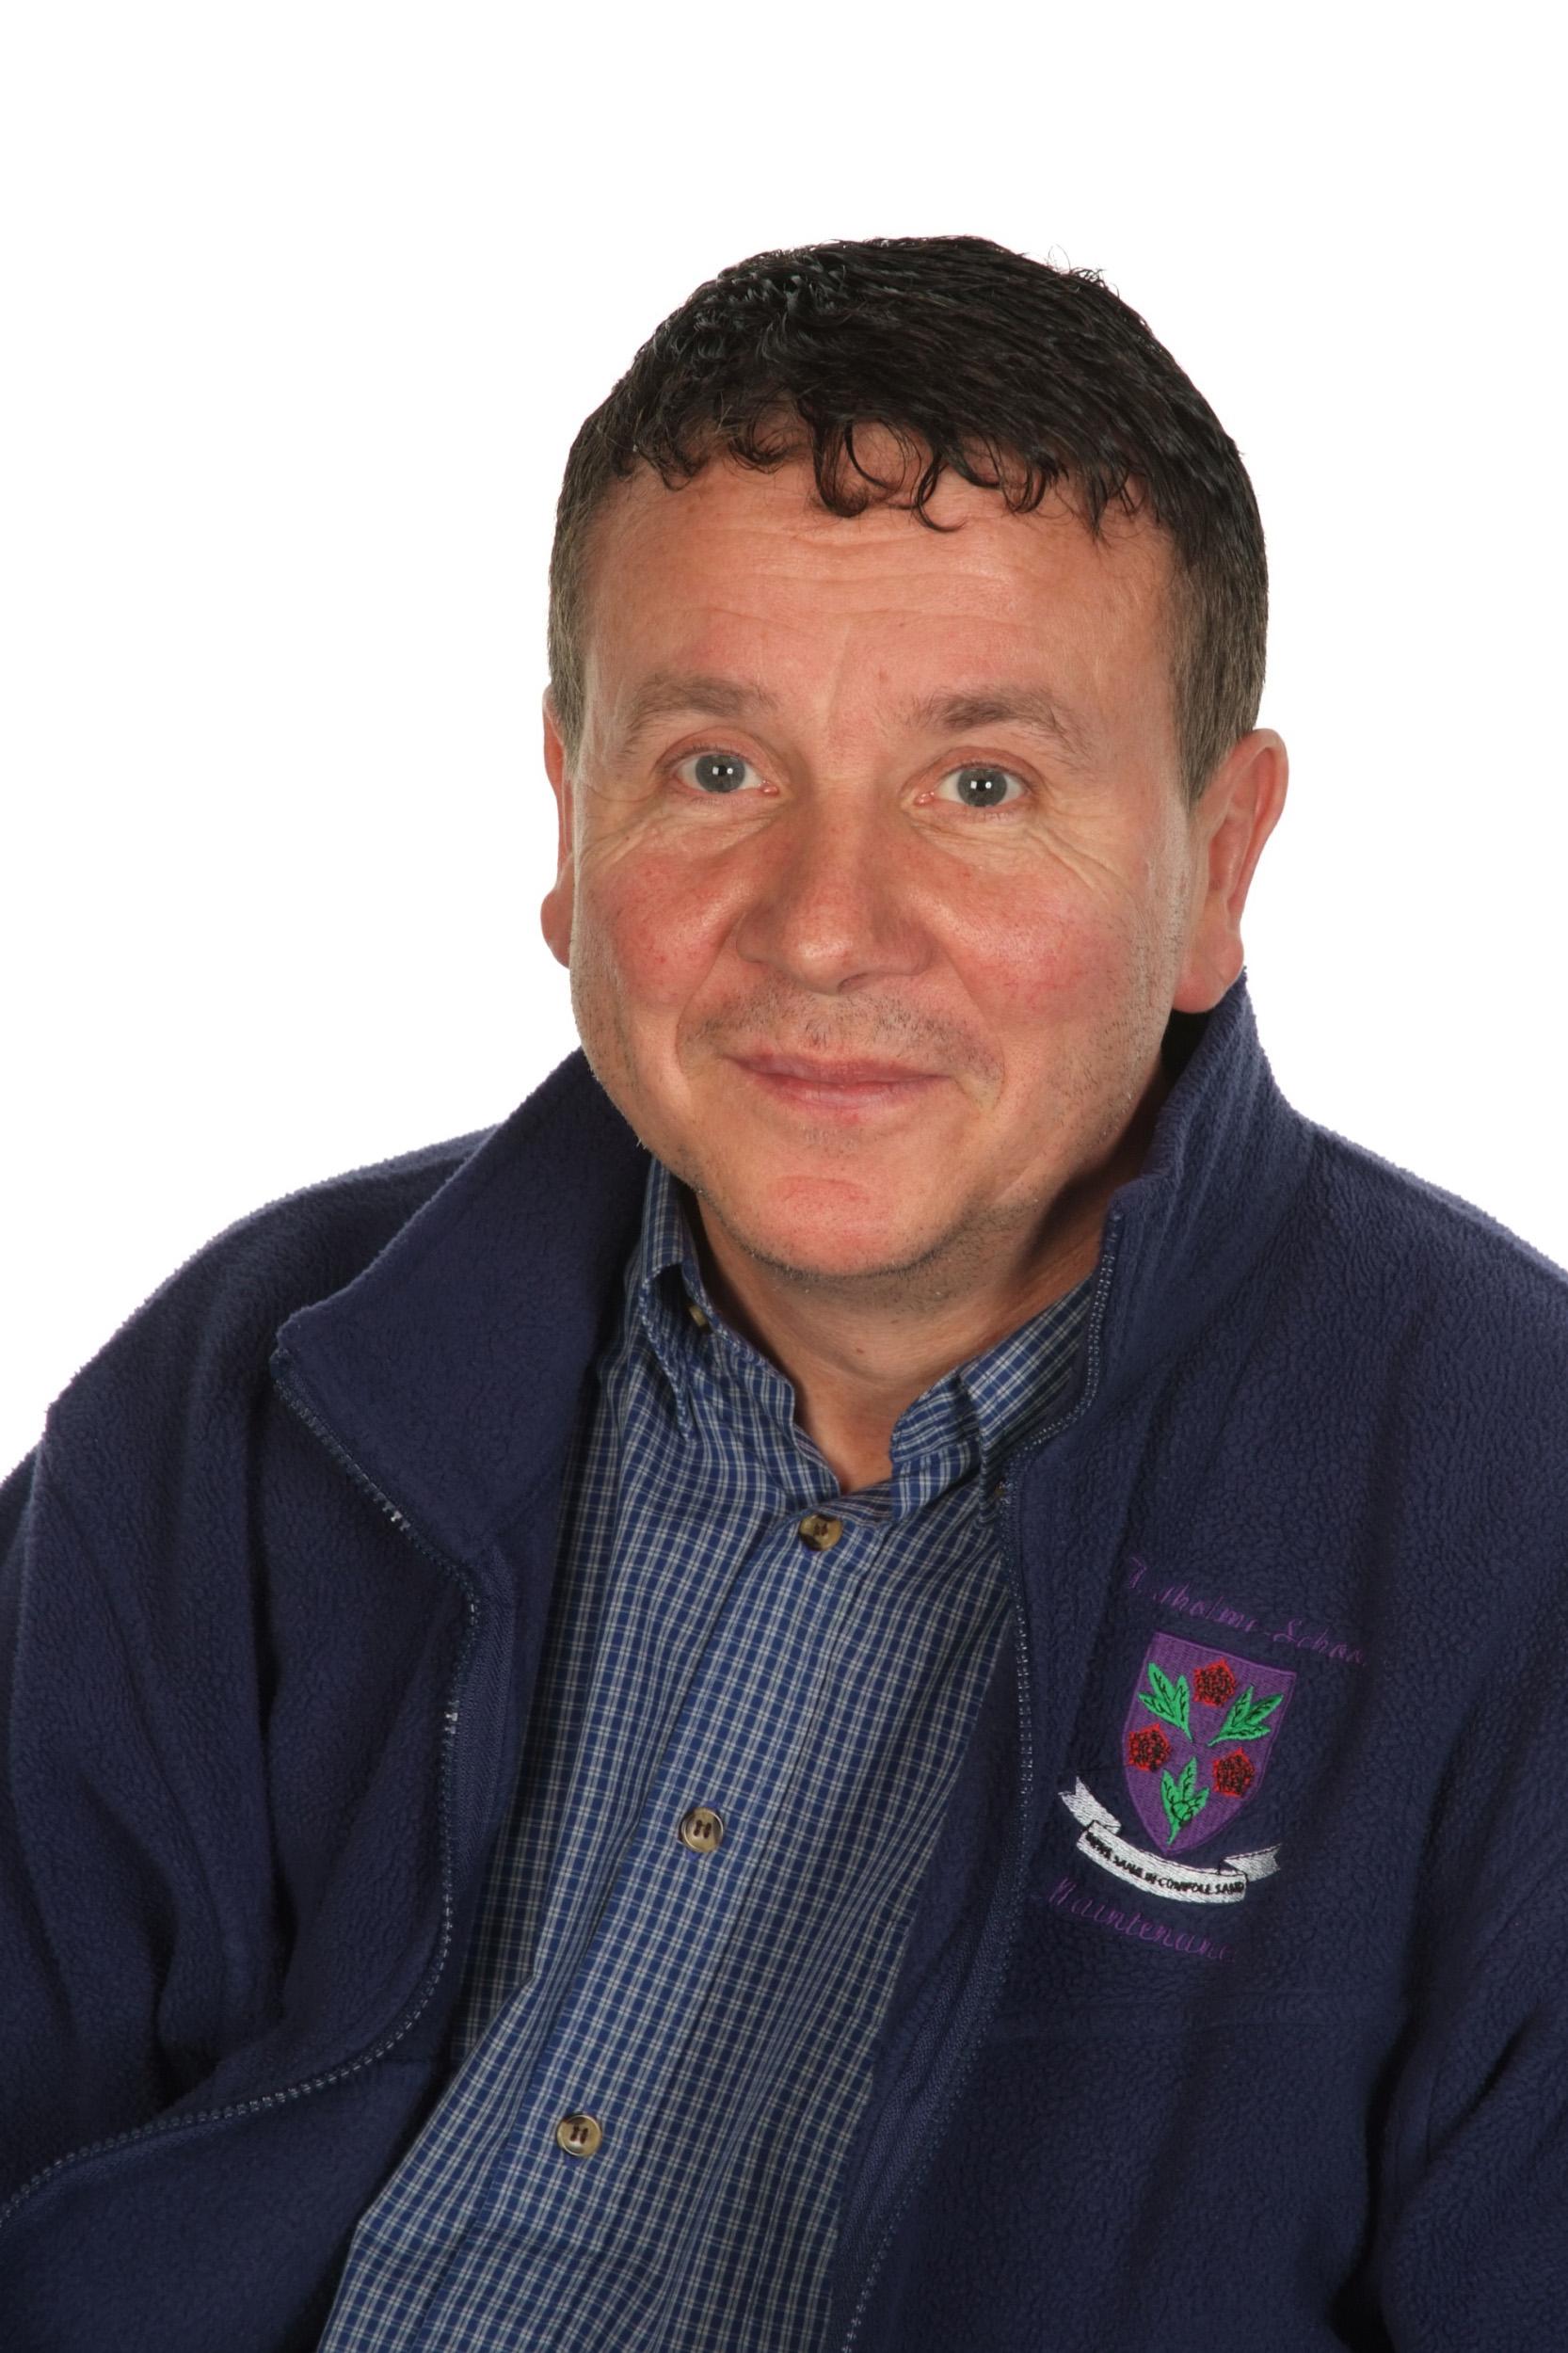 Tony McKenna